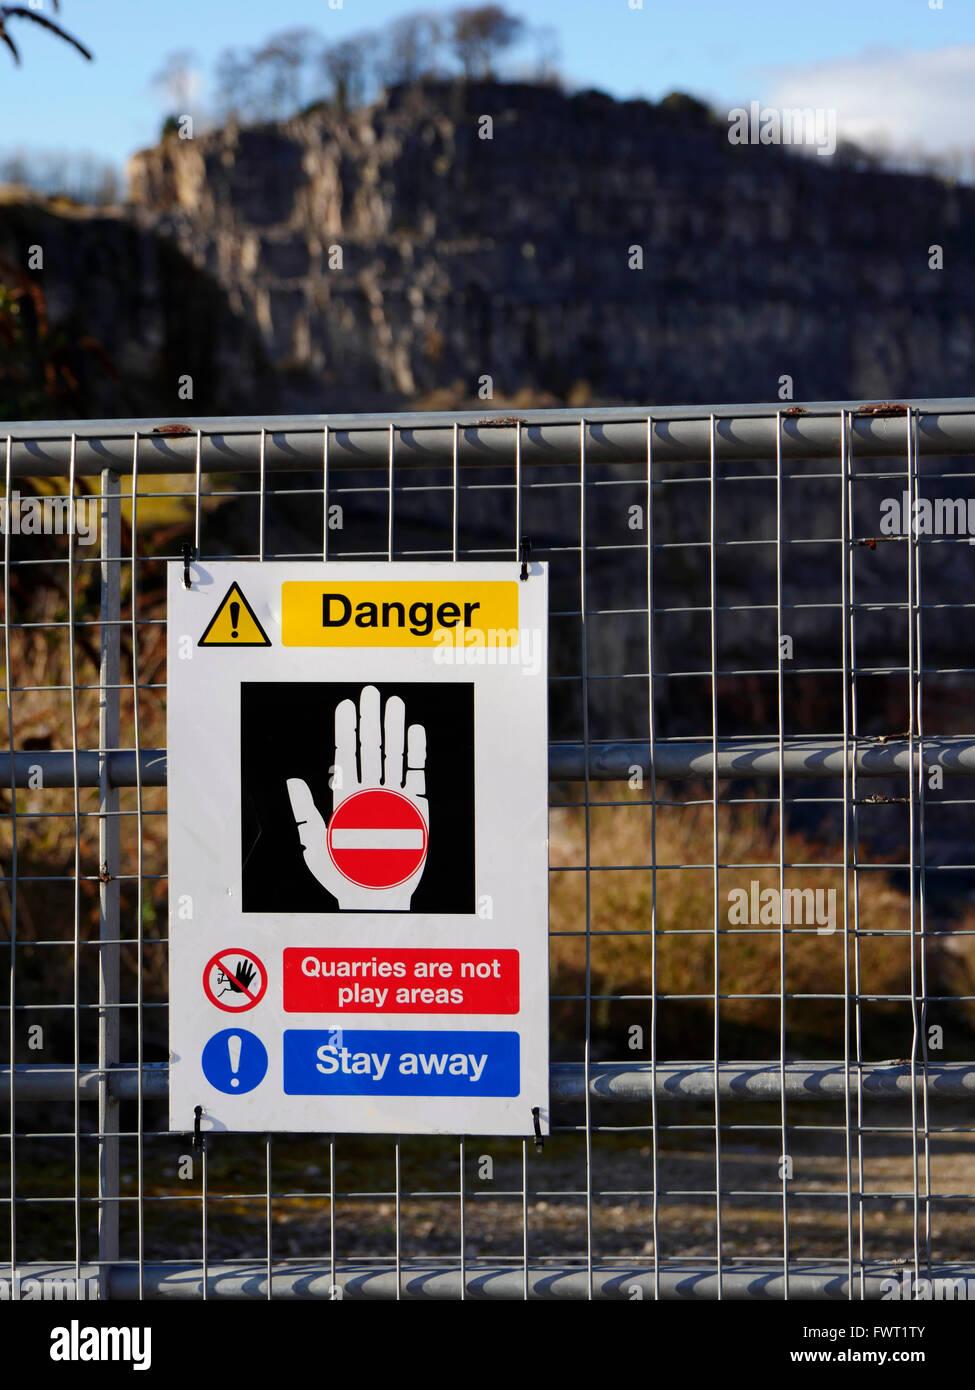 Danger sign limestone quarry at Wirksworth Cromford village town Peak District National Park, Derbyshire planning - Stock Image